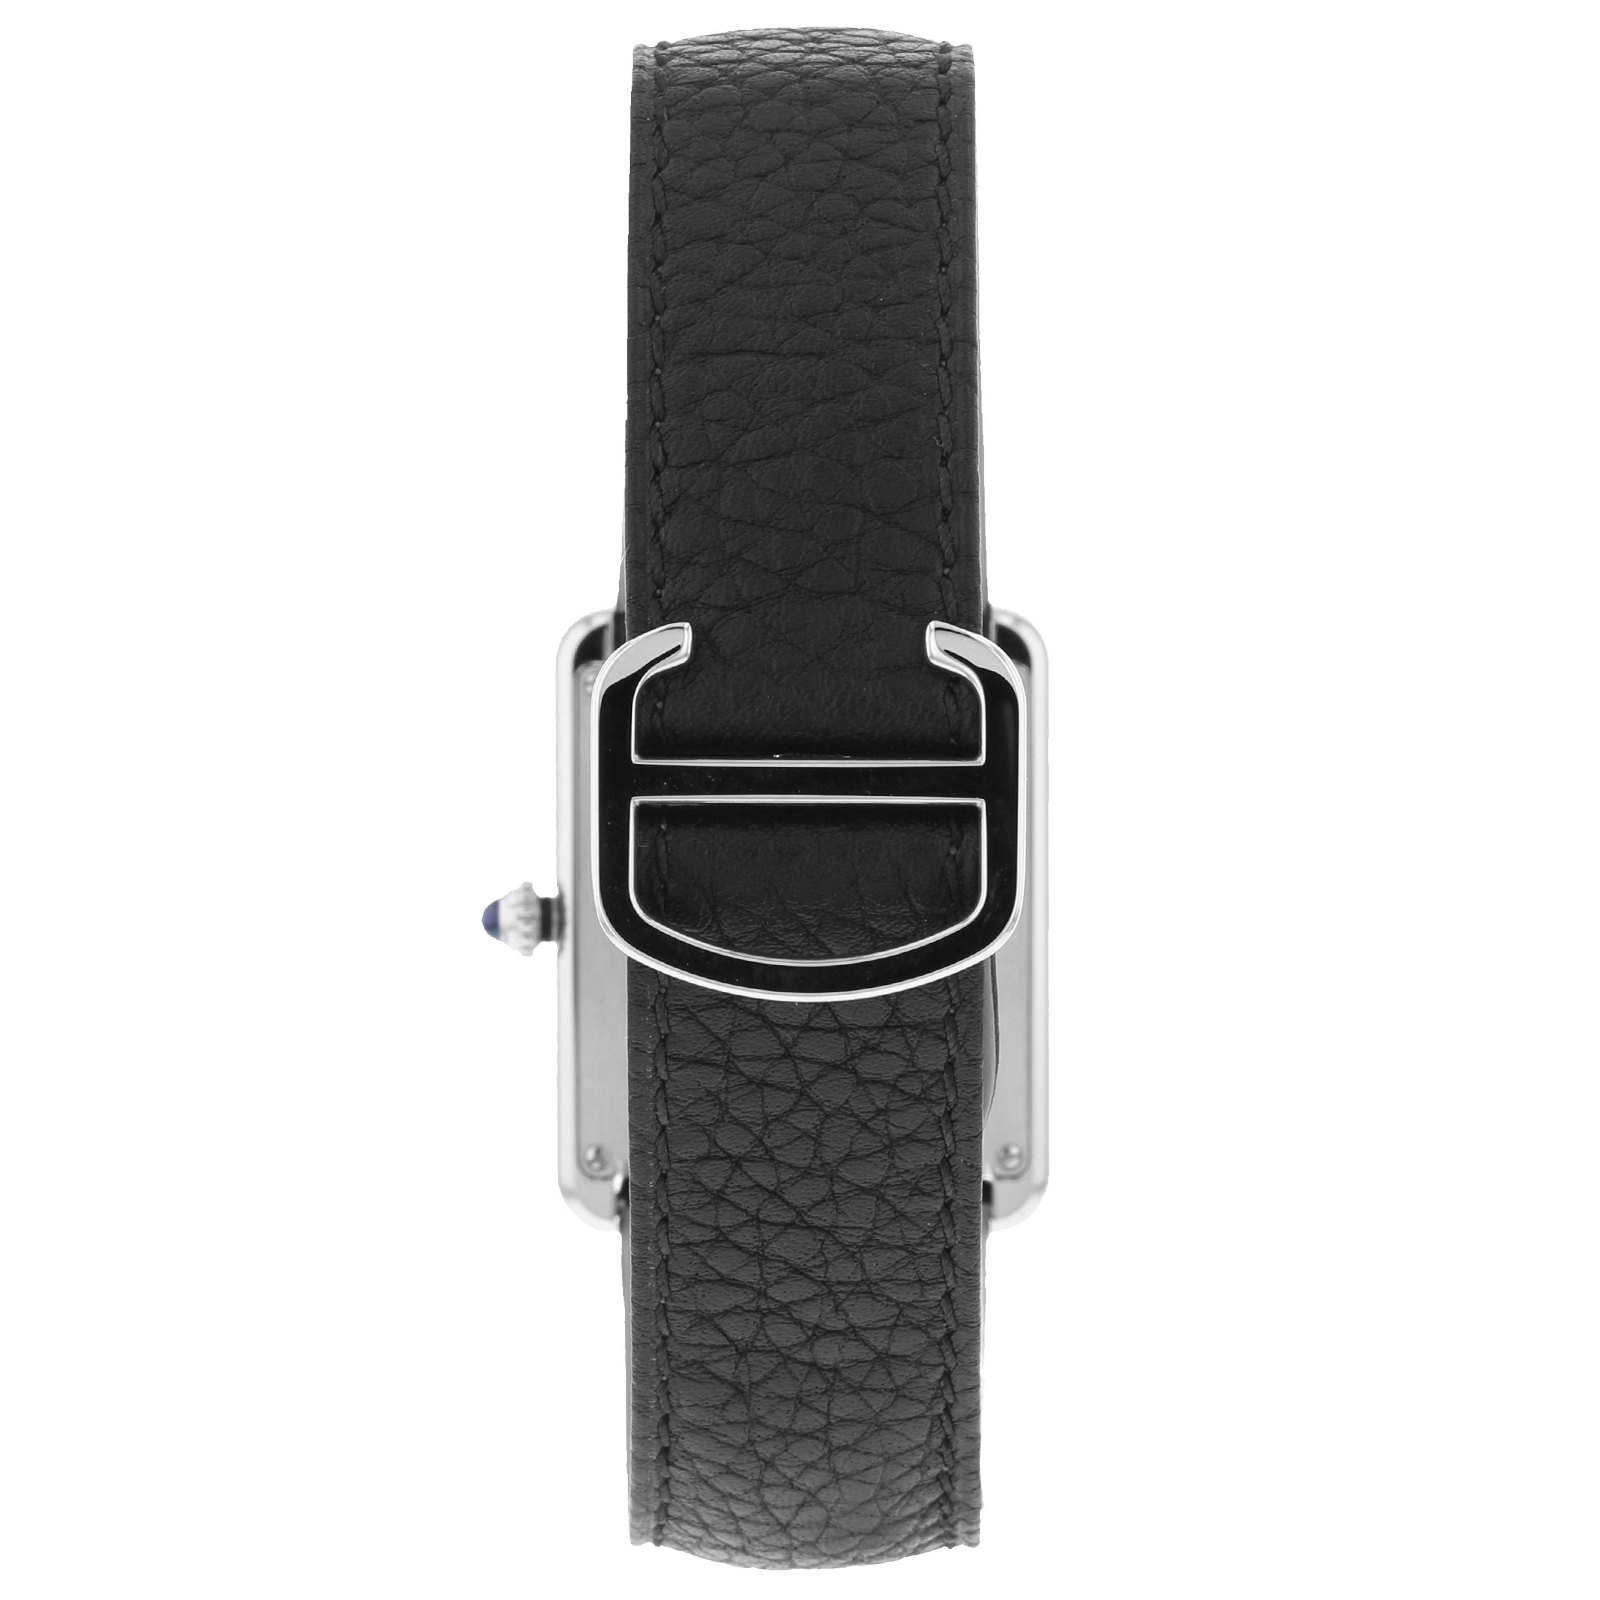 Cartier Montre Tank Solo, Large model, steel, leather